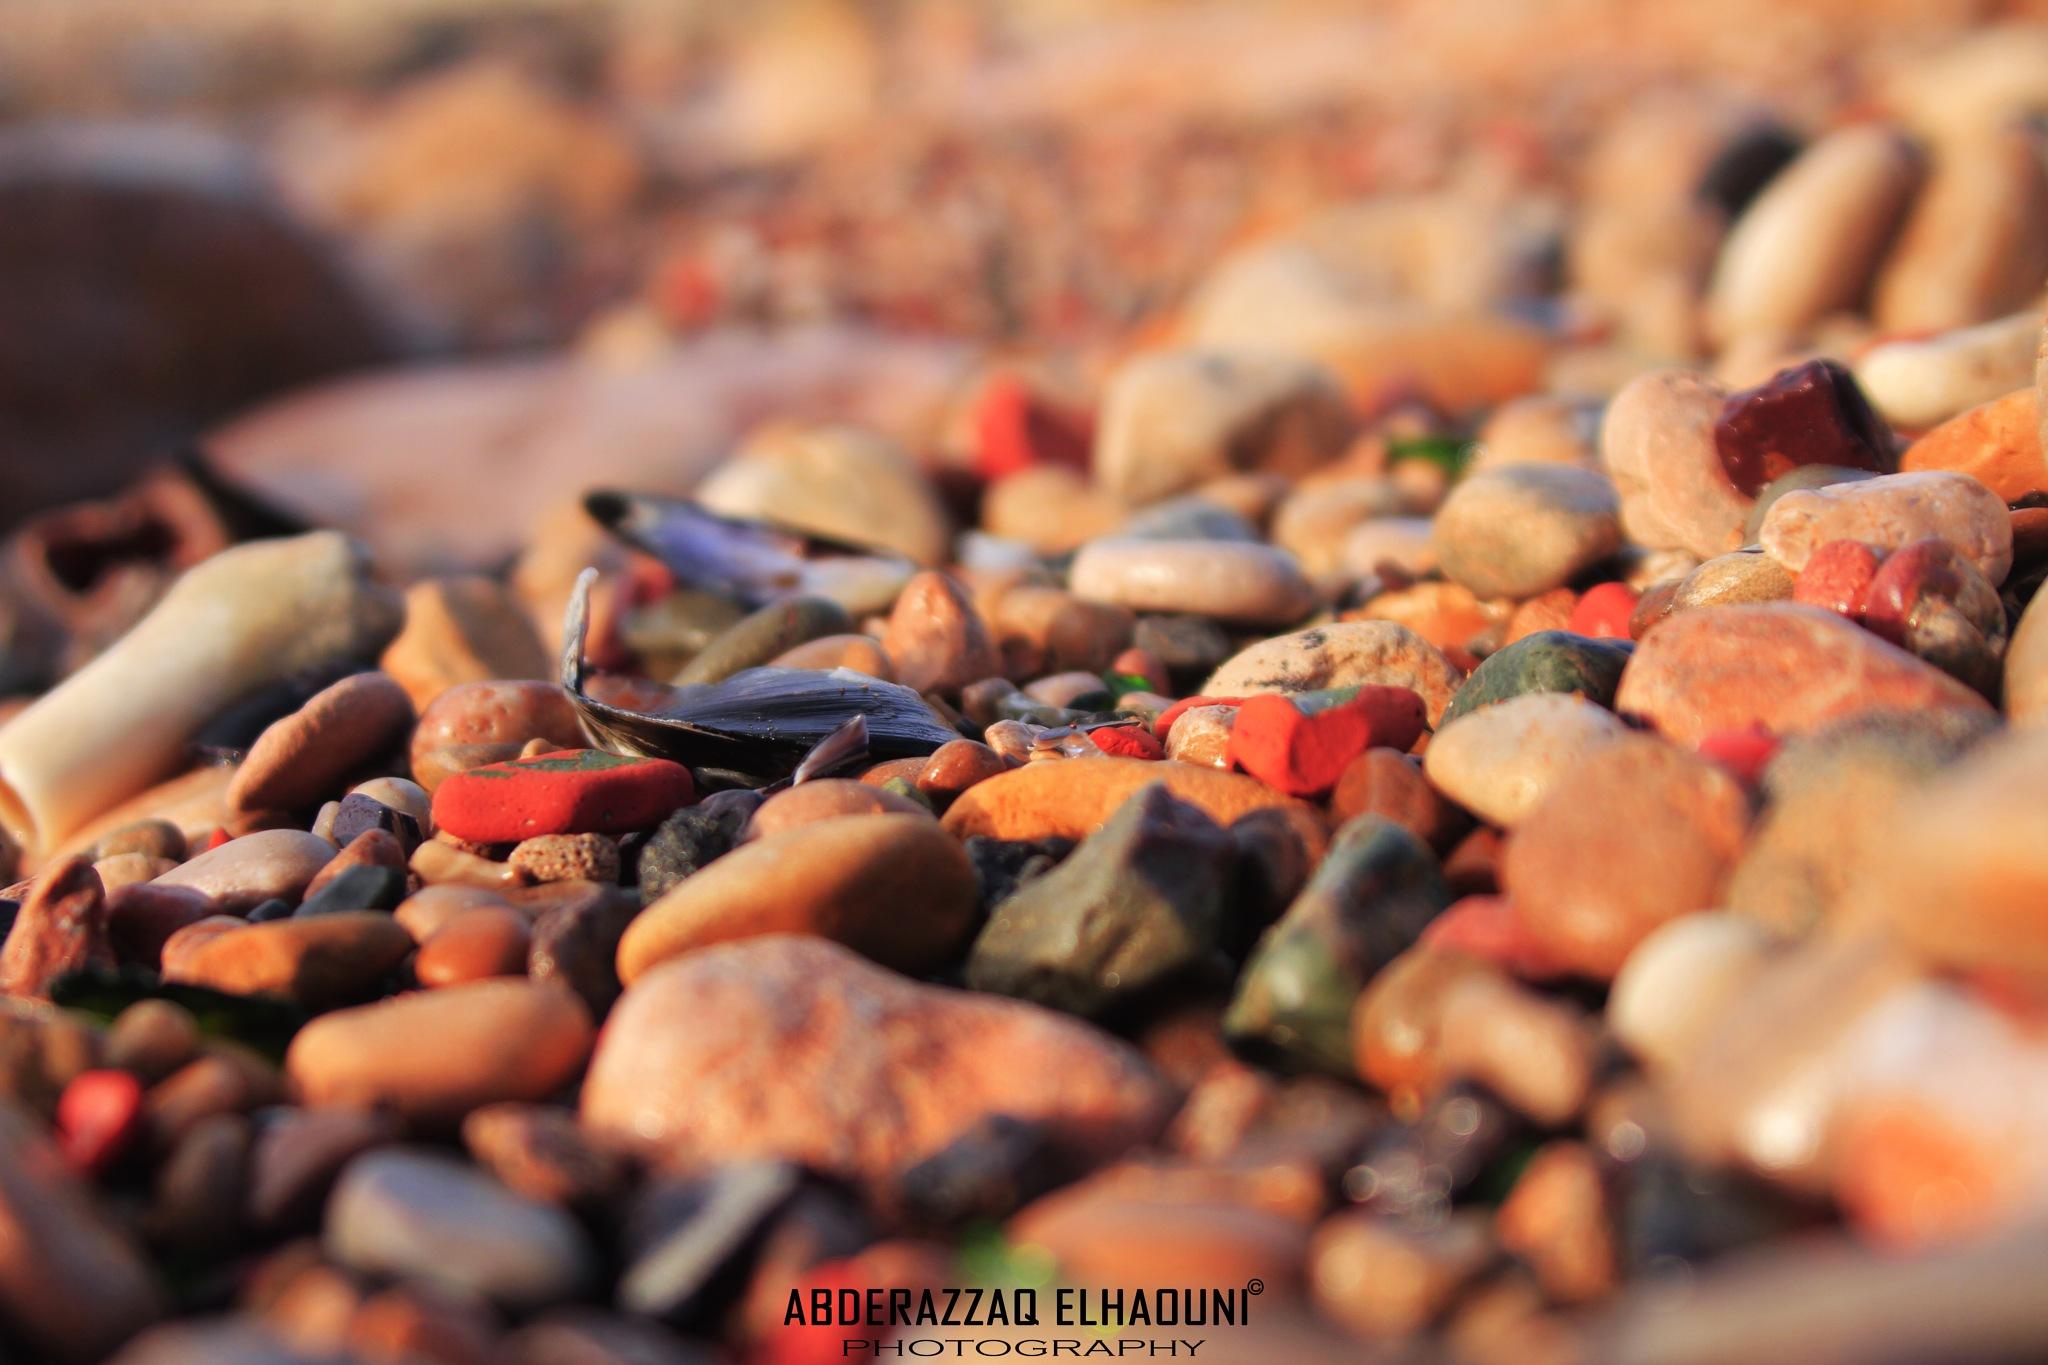 Untitled by Abderazzaq Photography